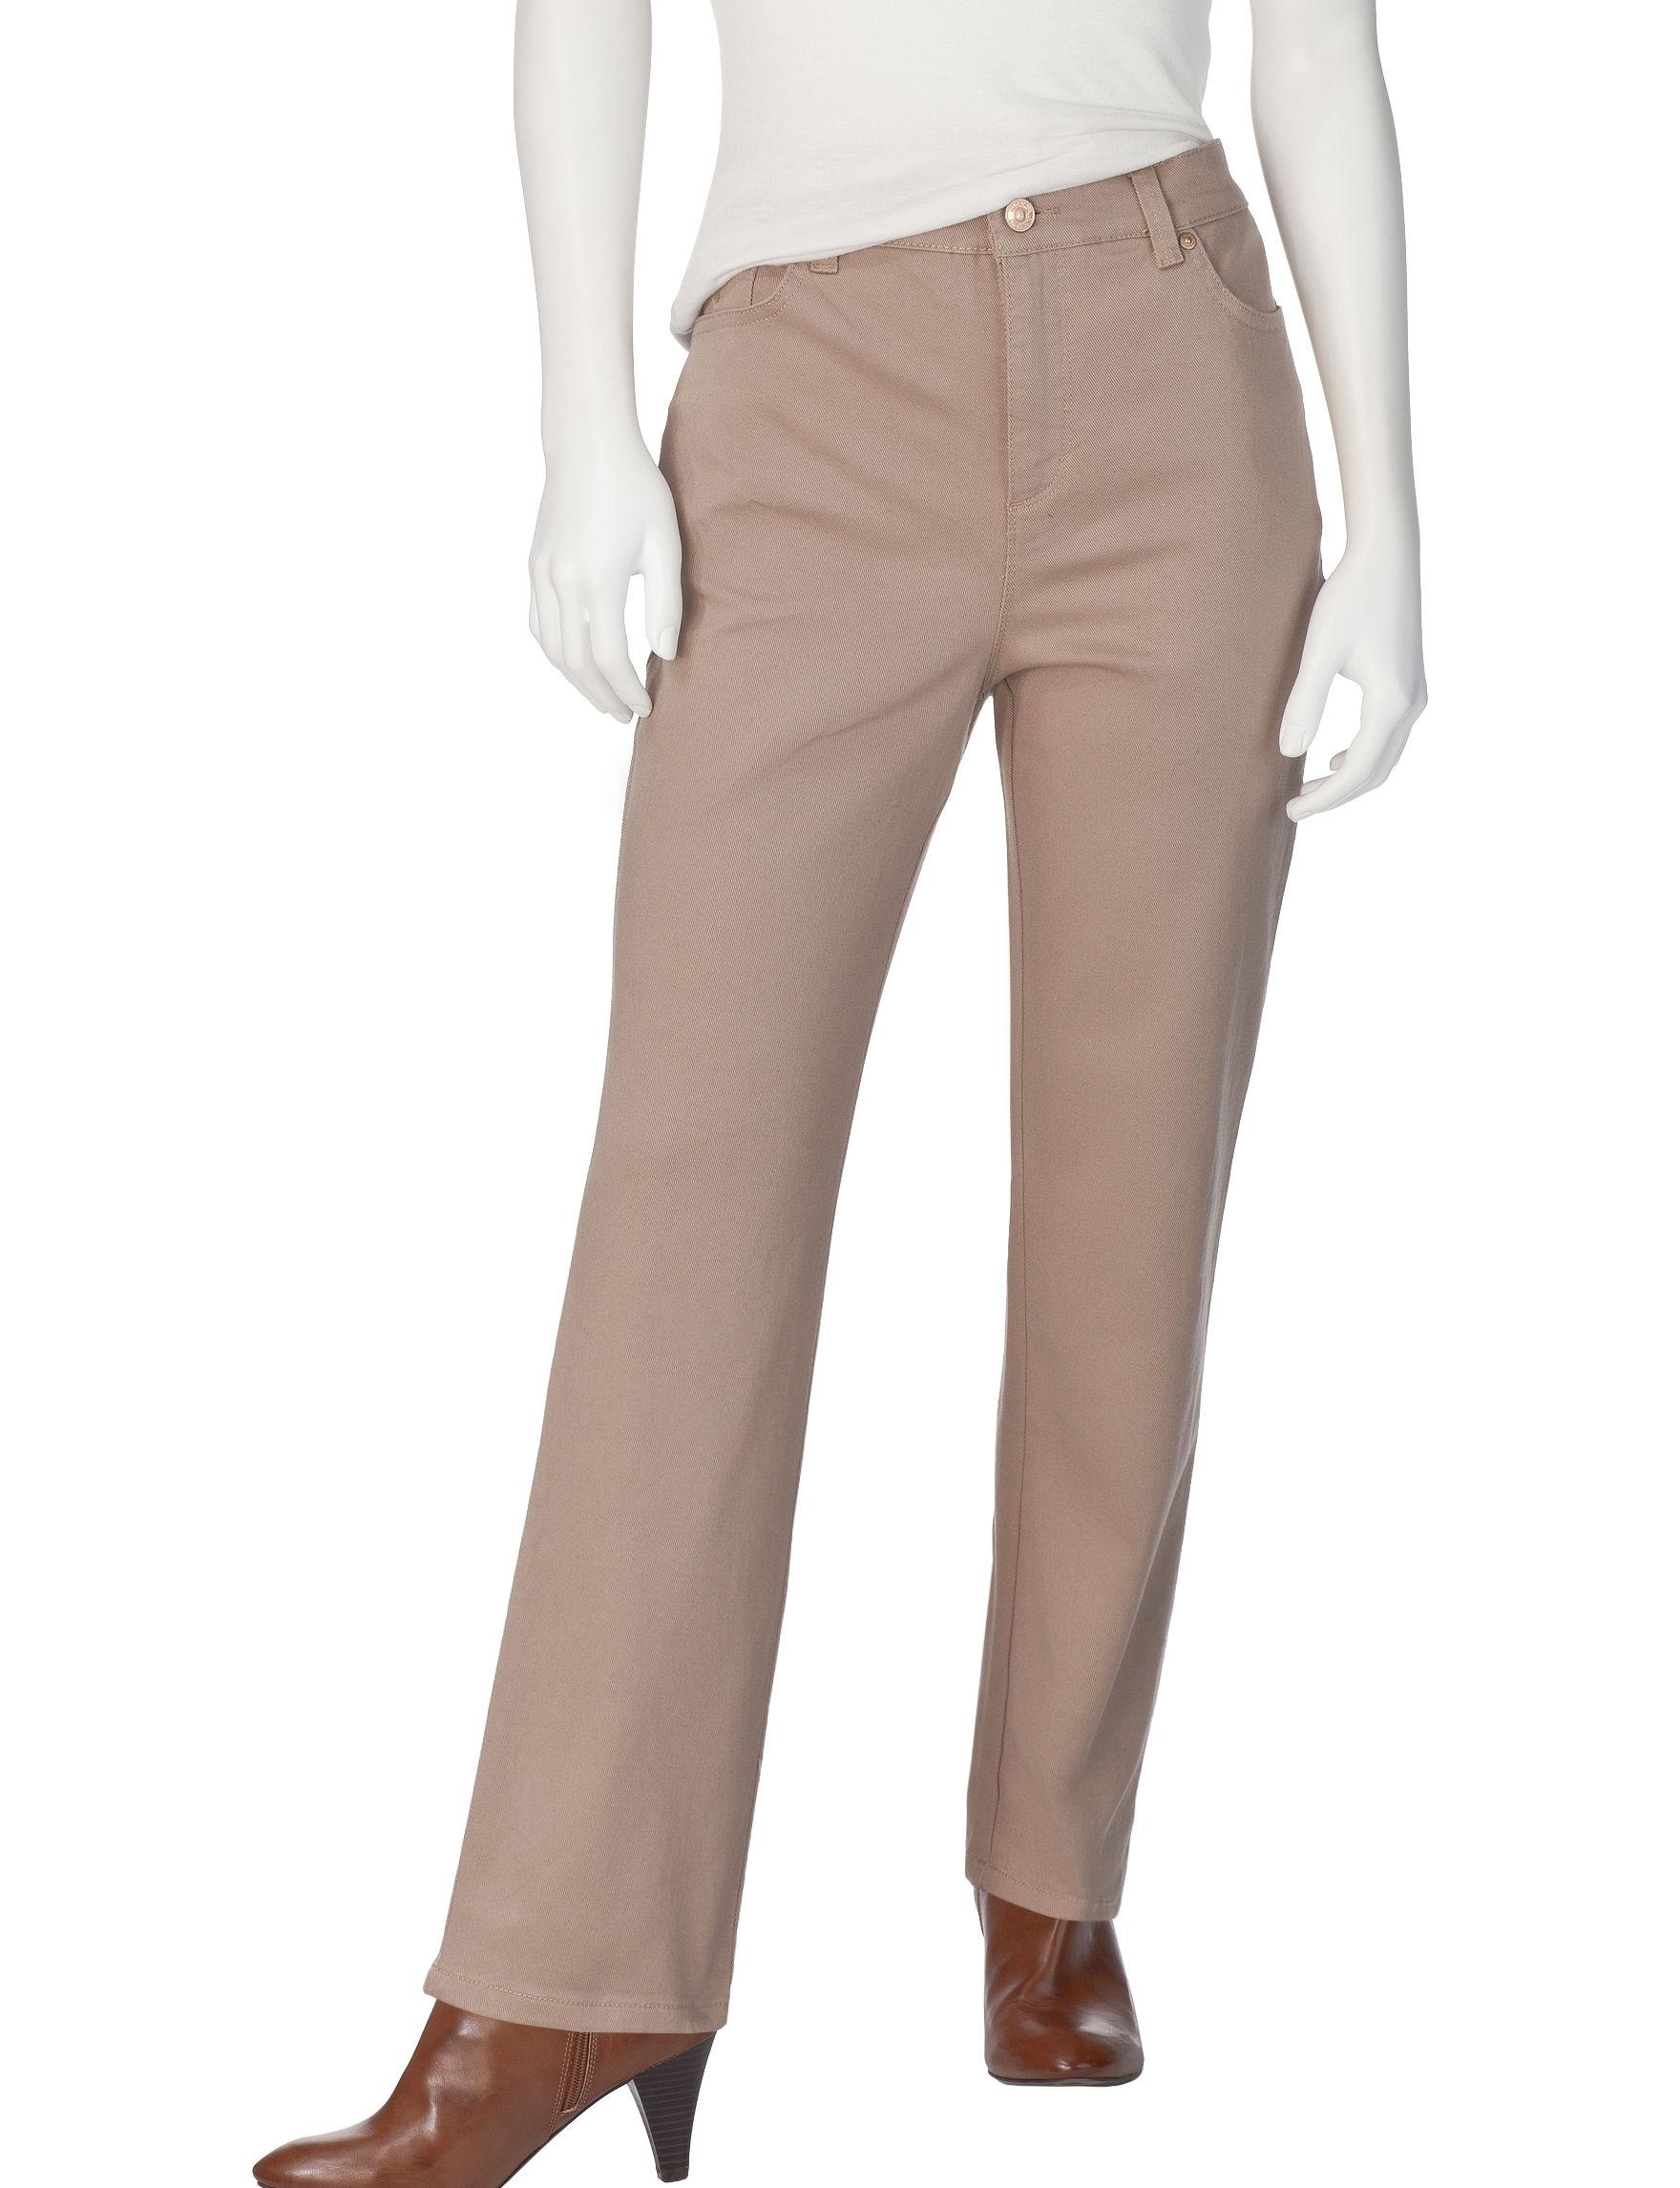 Gloria Vanderbilt Latte Soft Pants